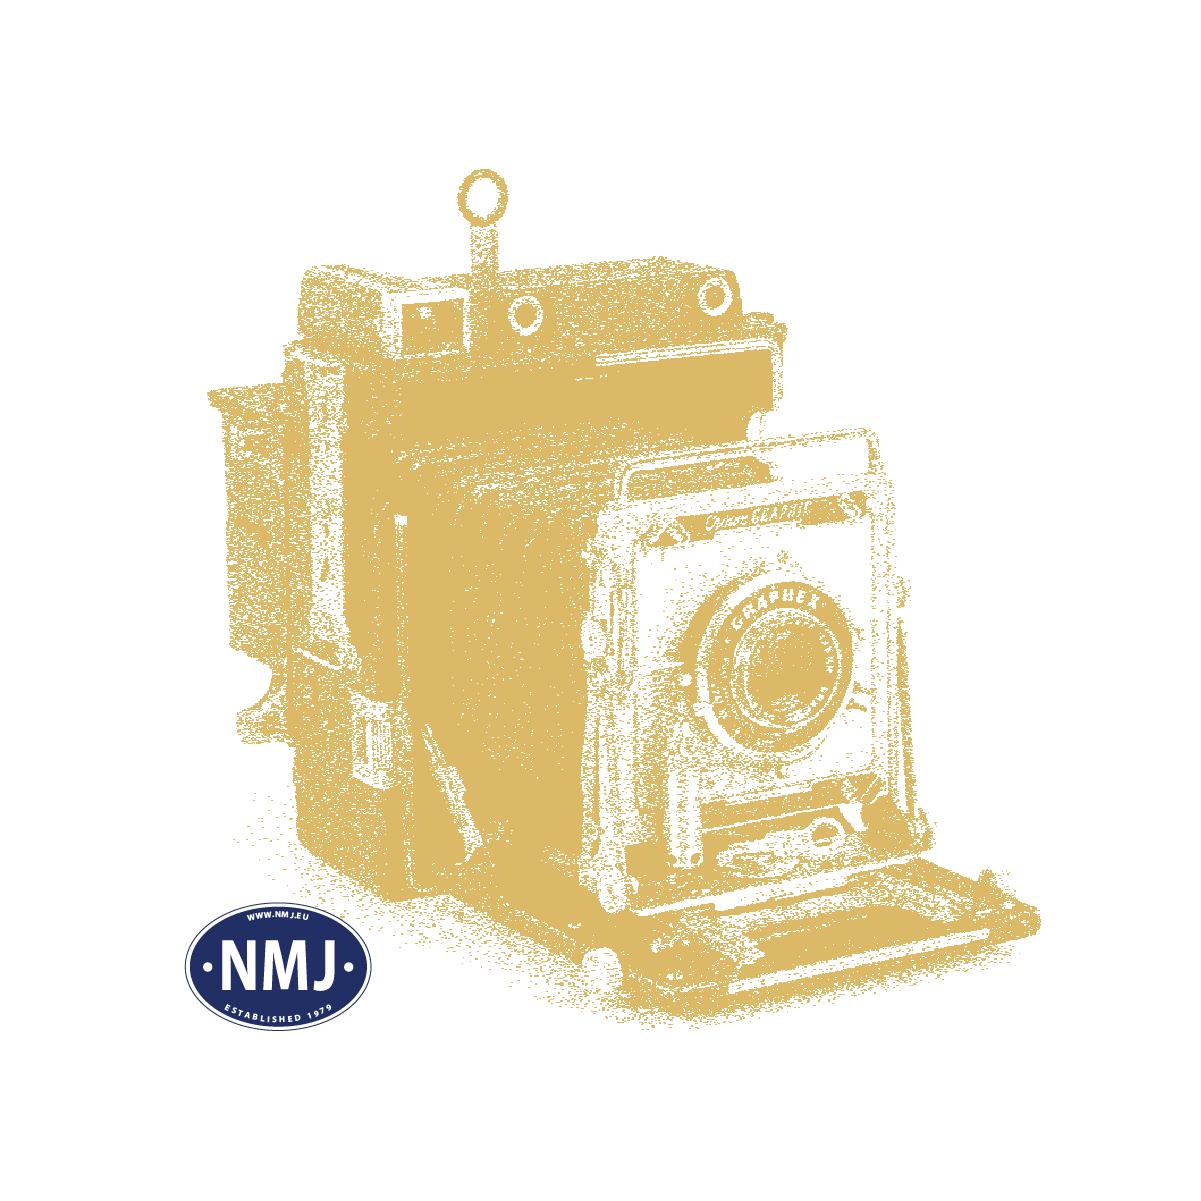 NMJT82.301 - NMJ Topline NSB El13.2136, Rød/Sort, DC